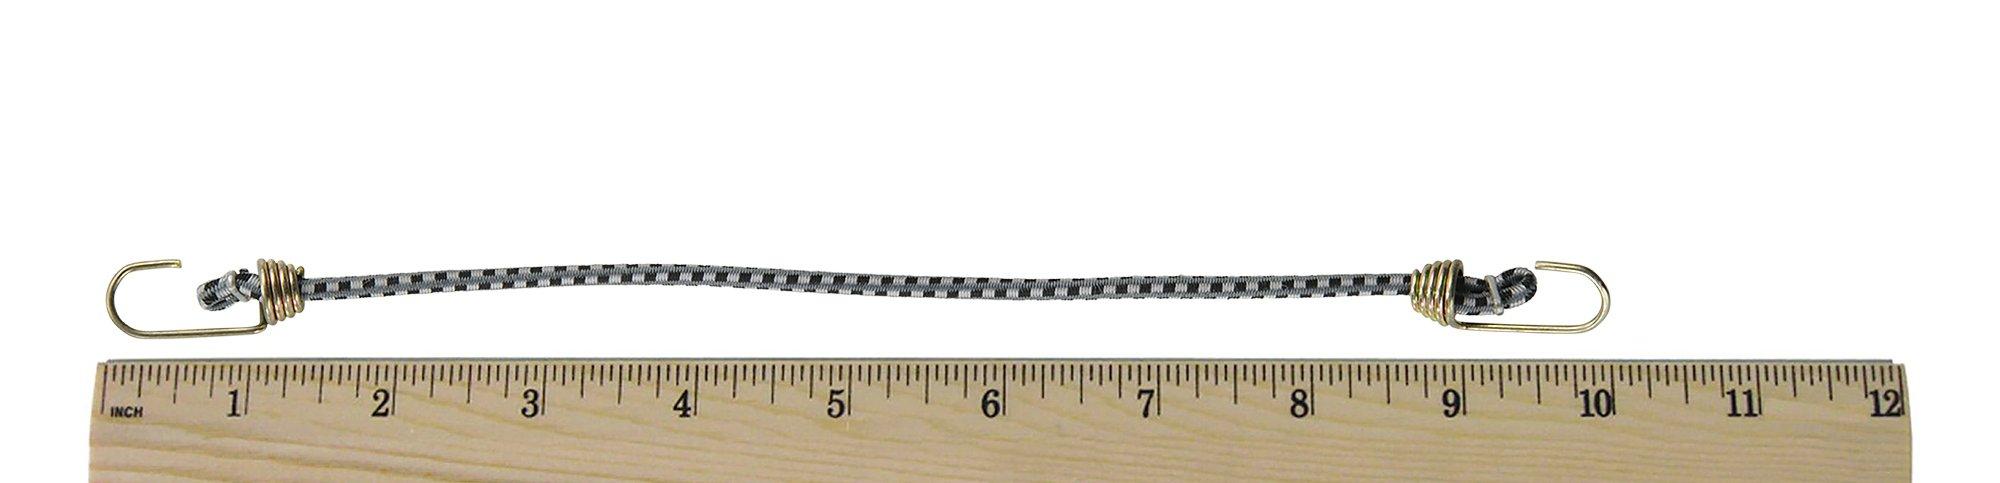 Keeper (06052 10'' Mini Bungee Cord, (Pack of 8)